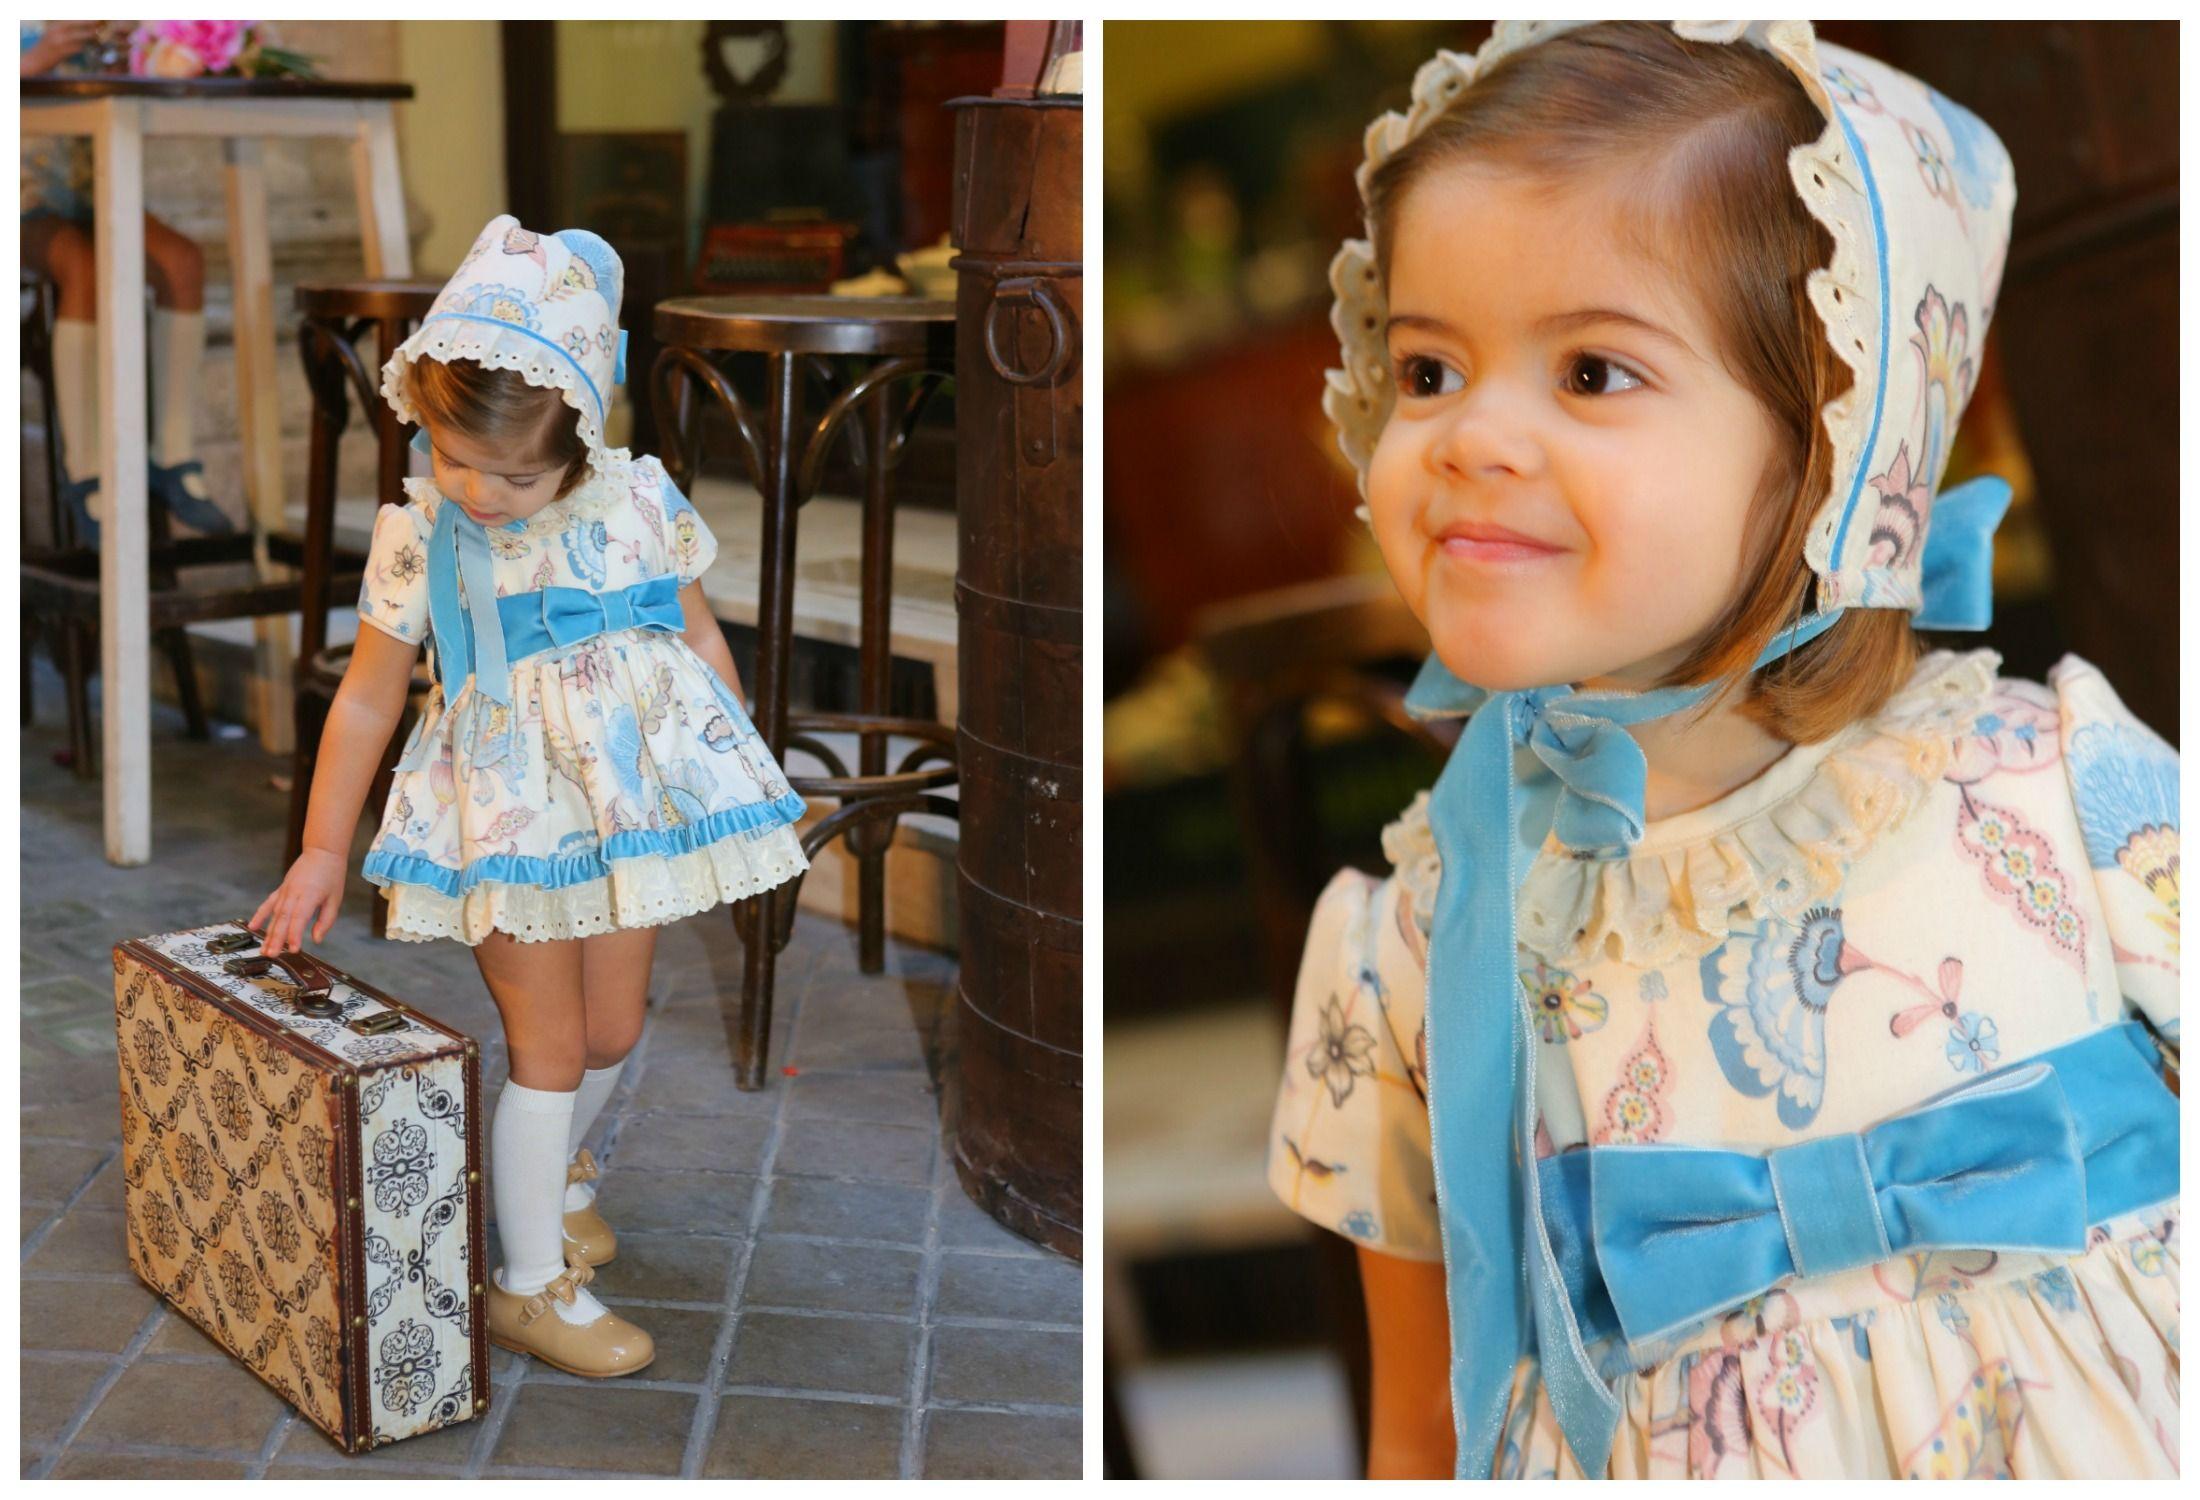 Jesusitoni a vestidodeni as beb s ni as modainfantil ropainfantil oportunidades nen - Monalisa moda infantil ...